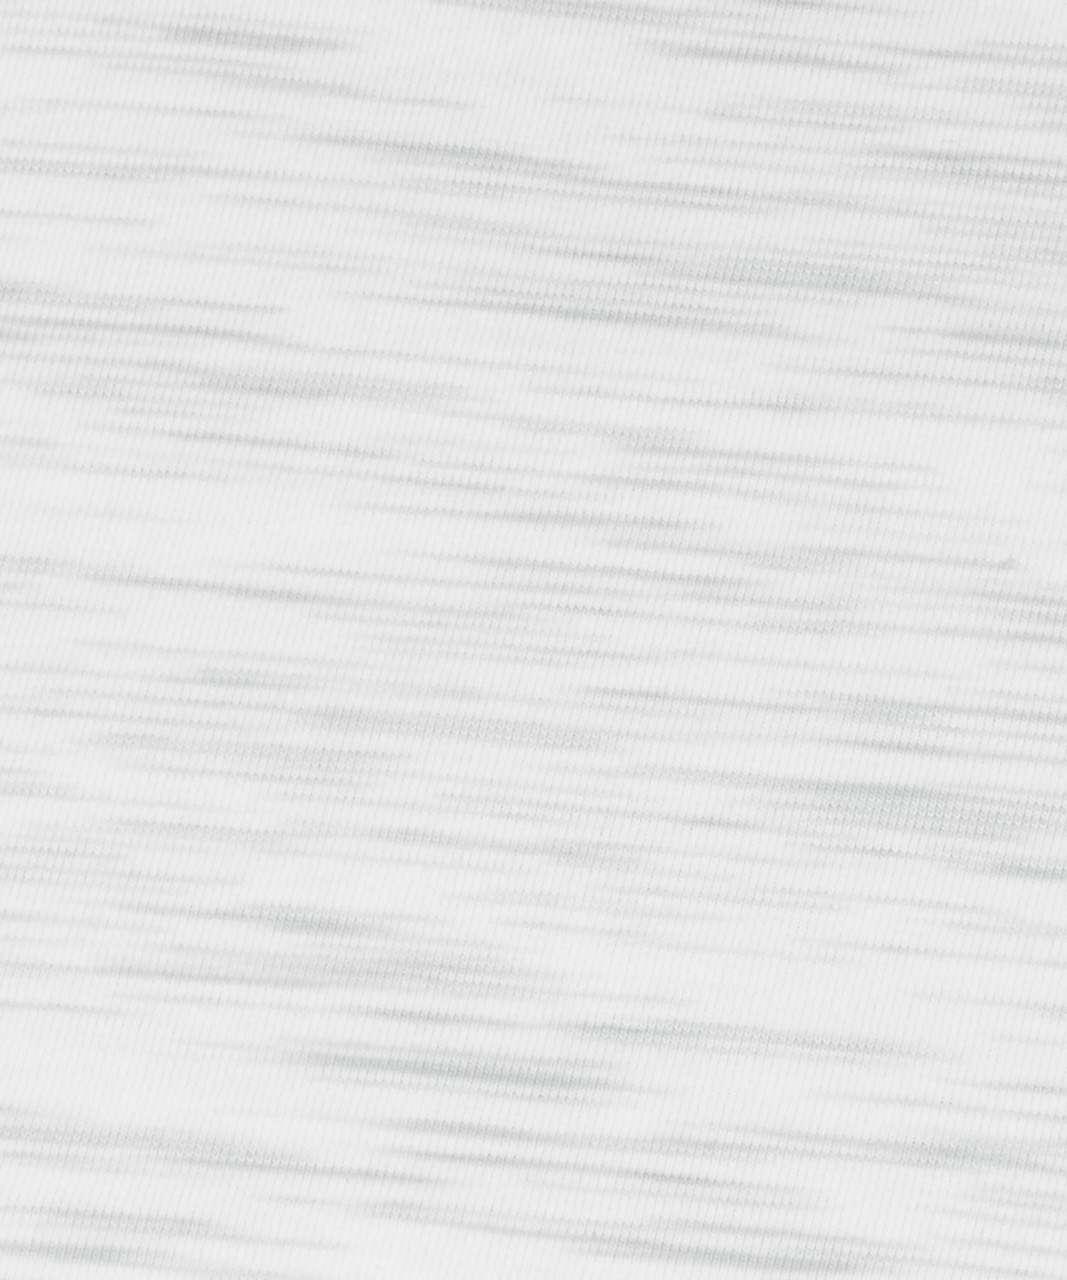 Lululemon Love Tank *Pleated - 3 Colour Space Dye Ice Grey Alpine White